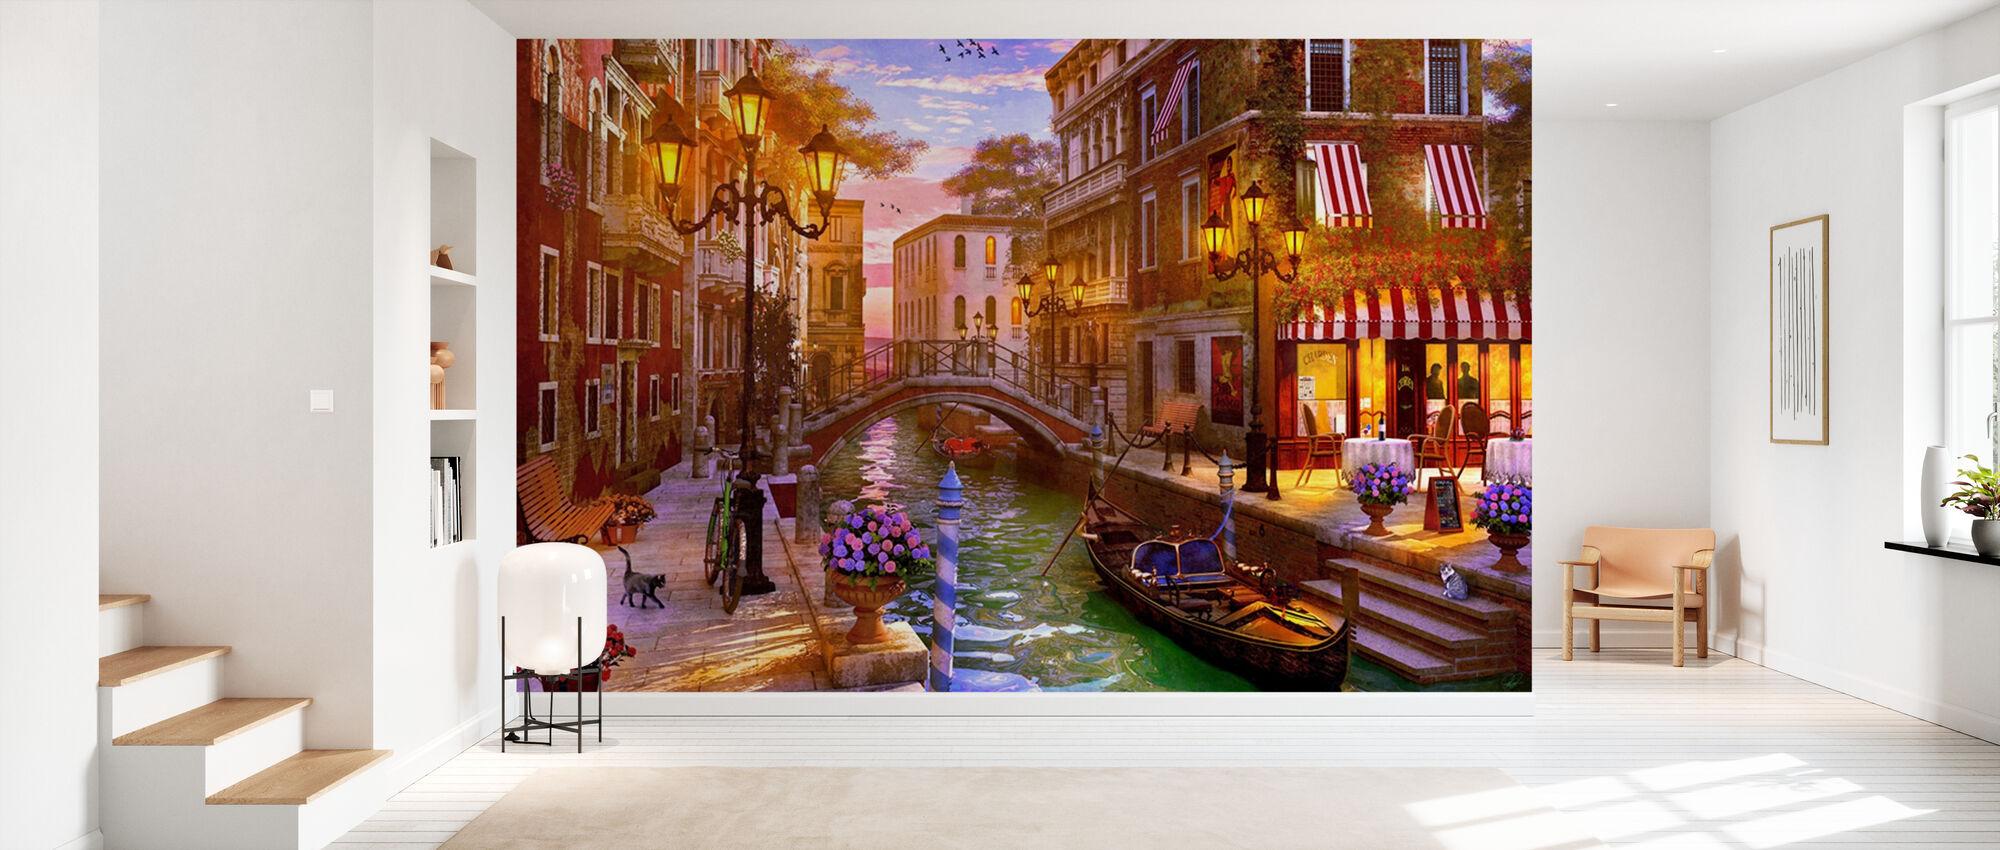 Sunset over Venice - Wallpaper - Hallway